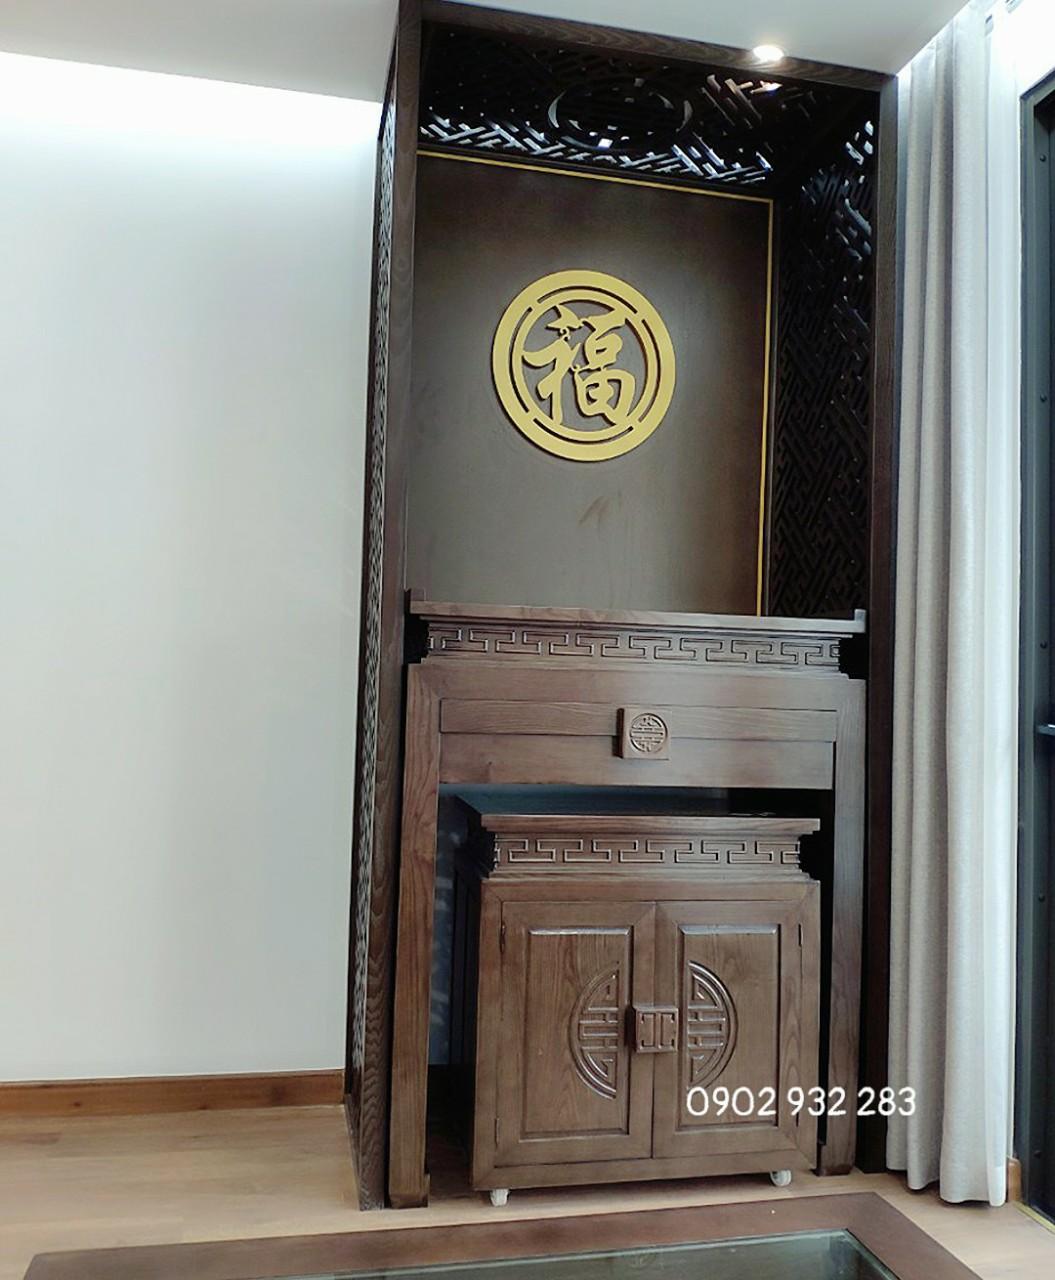 Bộ bàn thờ gỗ sồi 1m07 mẫu hiện đại M004